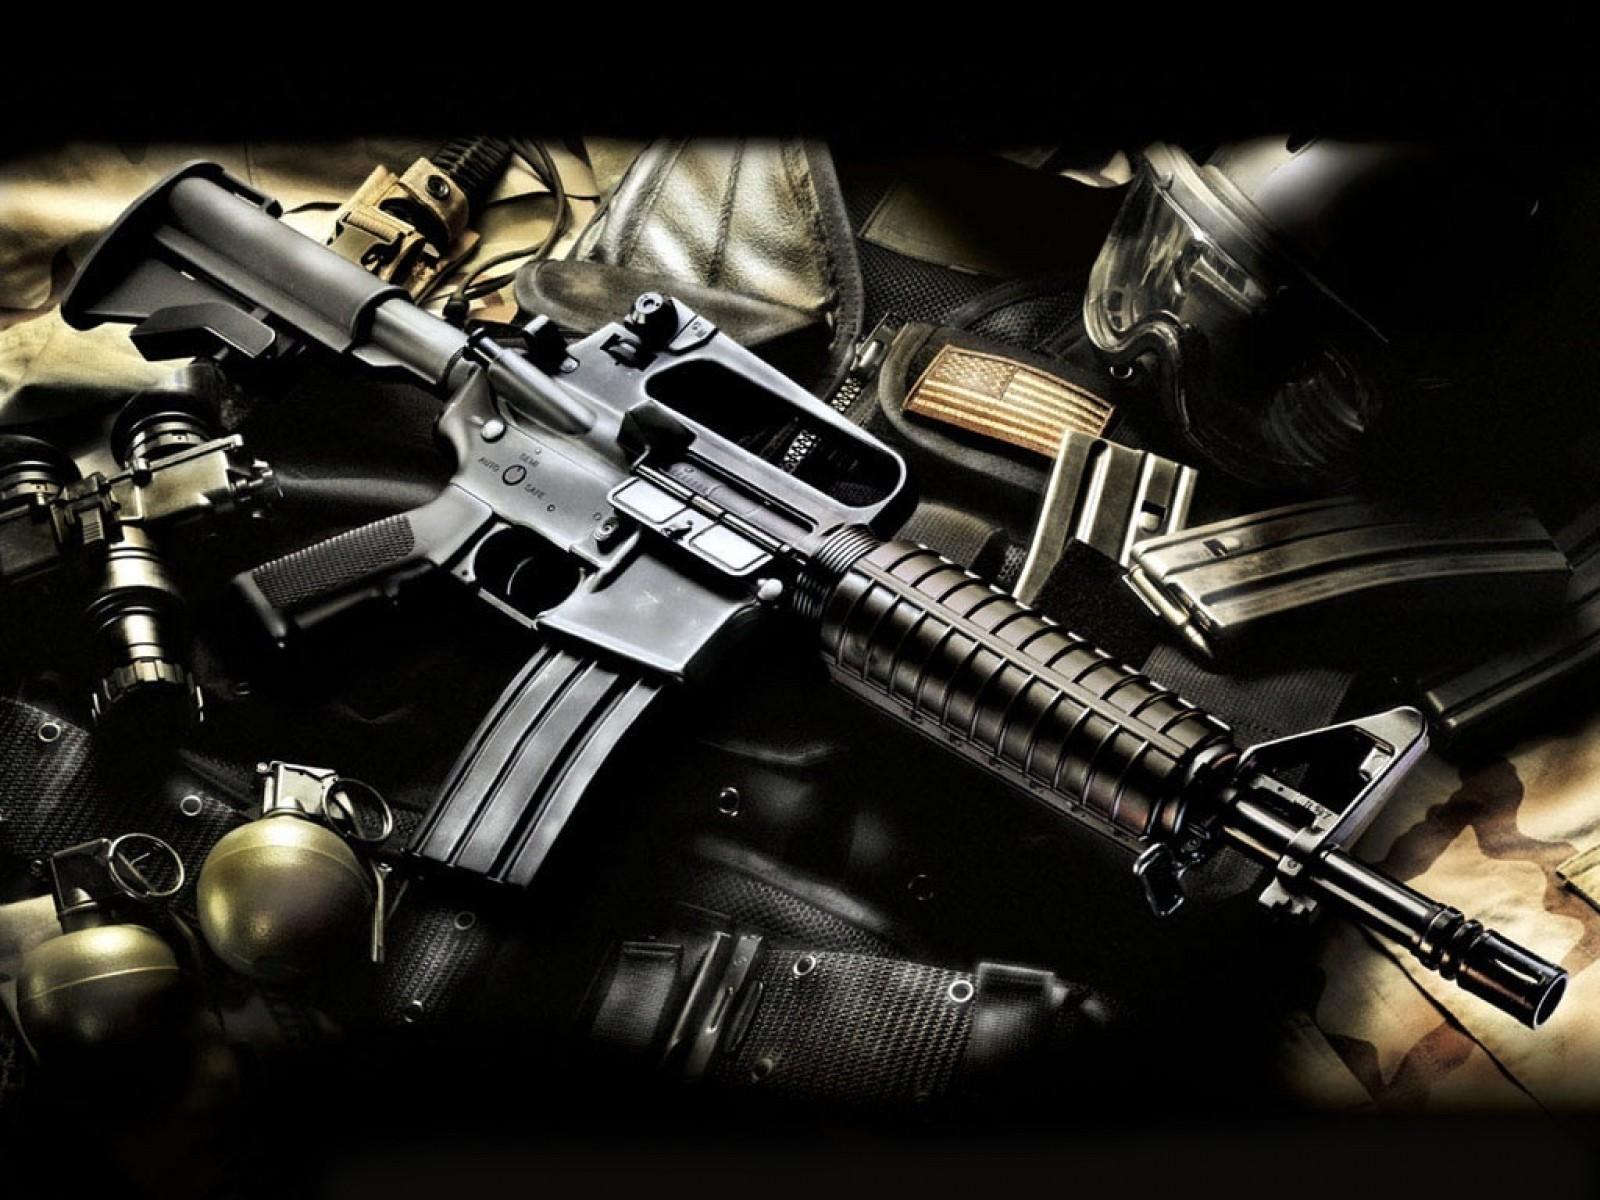 http://4.bp.blogspot.com/-XWKD-eqptmo/UAWAKkIz9aI/AAAAAAAAAIc/bnANLoGBy7c/s1600/Latest-Weapon-images-pictures-countries-weapons-arms-guns-pusca-gun-luneta-army-bullets-munite-sniper-pistol-ammunition-swat-solide-special-tr.jpg